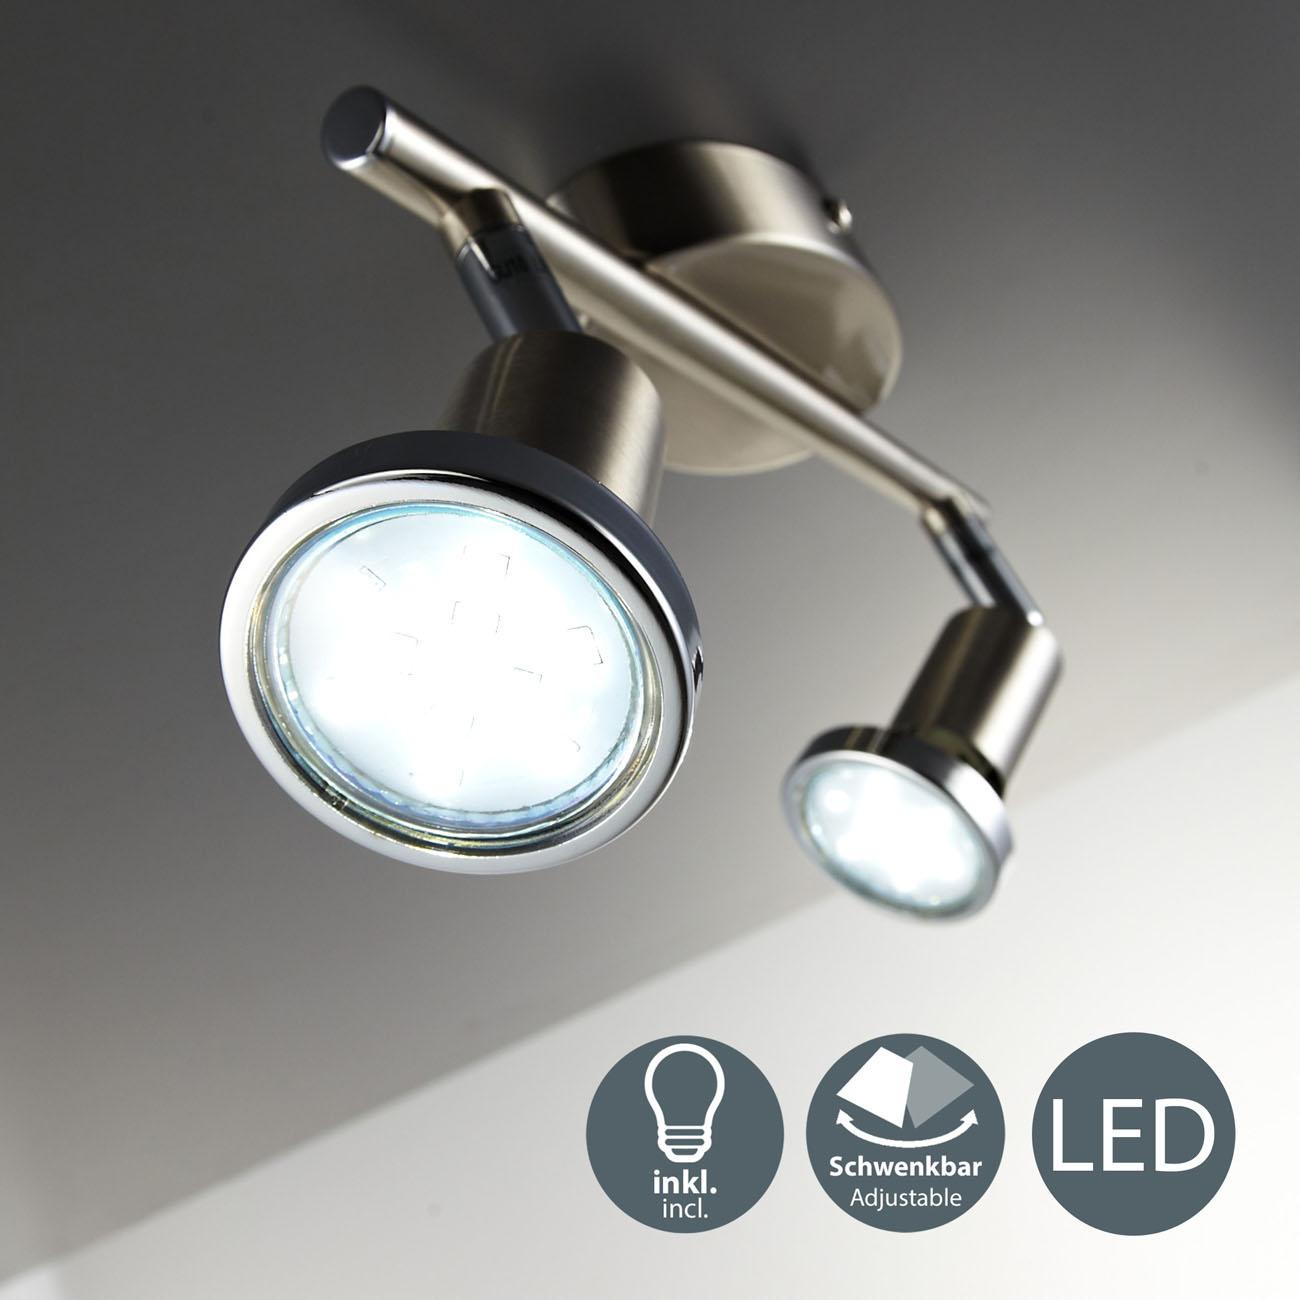 LED Deckenstrahler 2-flammig - 3